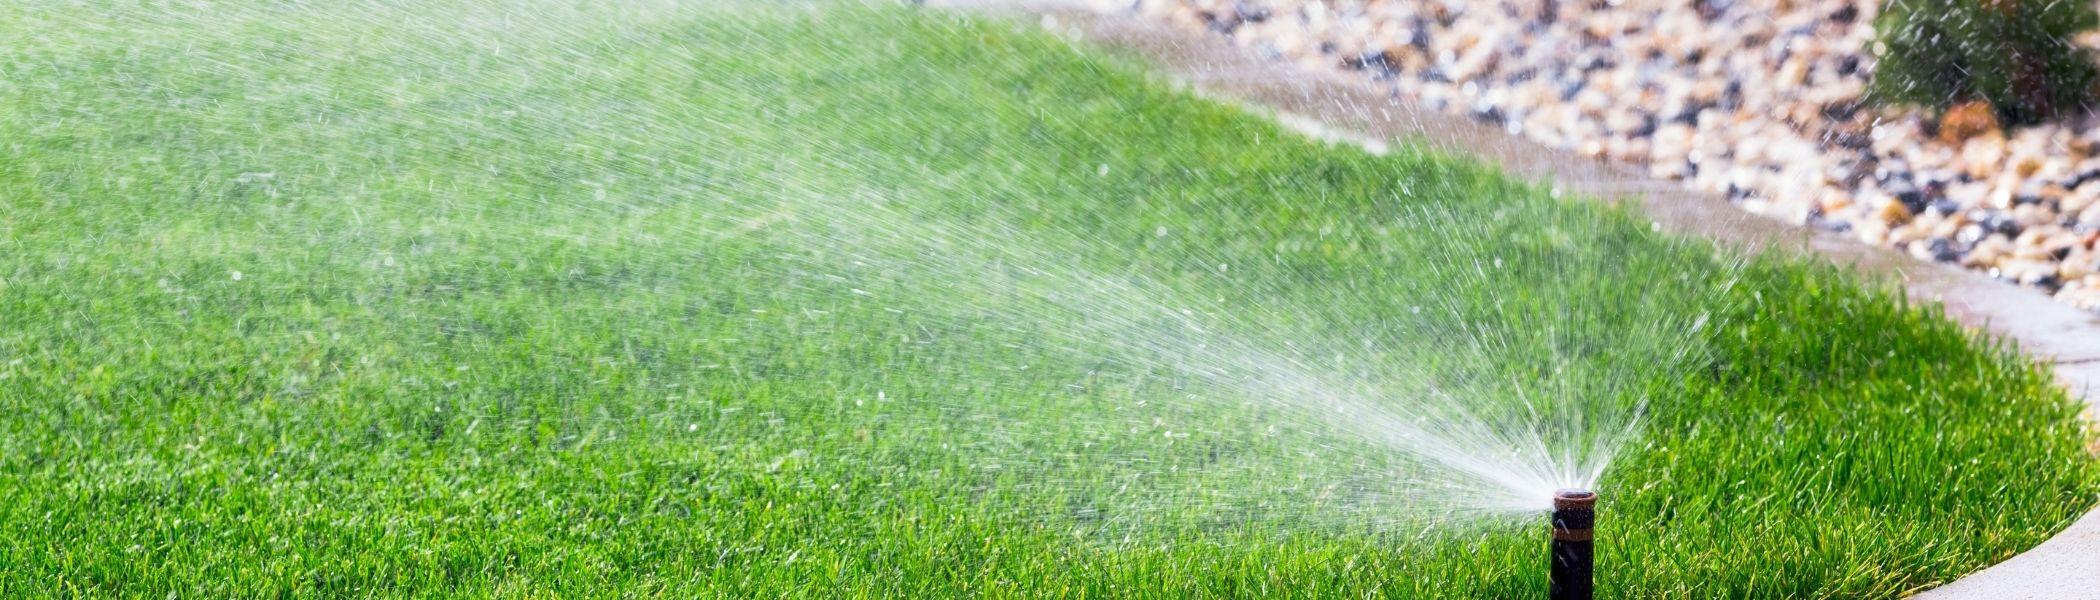 Irrigation System Design & Installation in Maryland, Virginia & D.C.